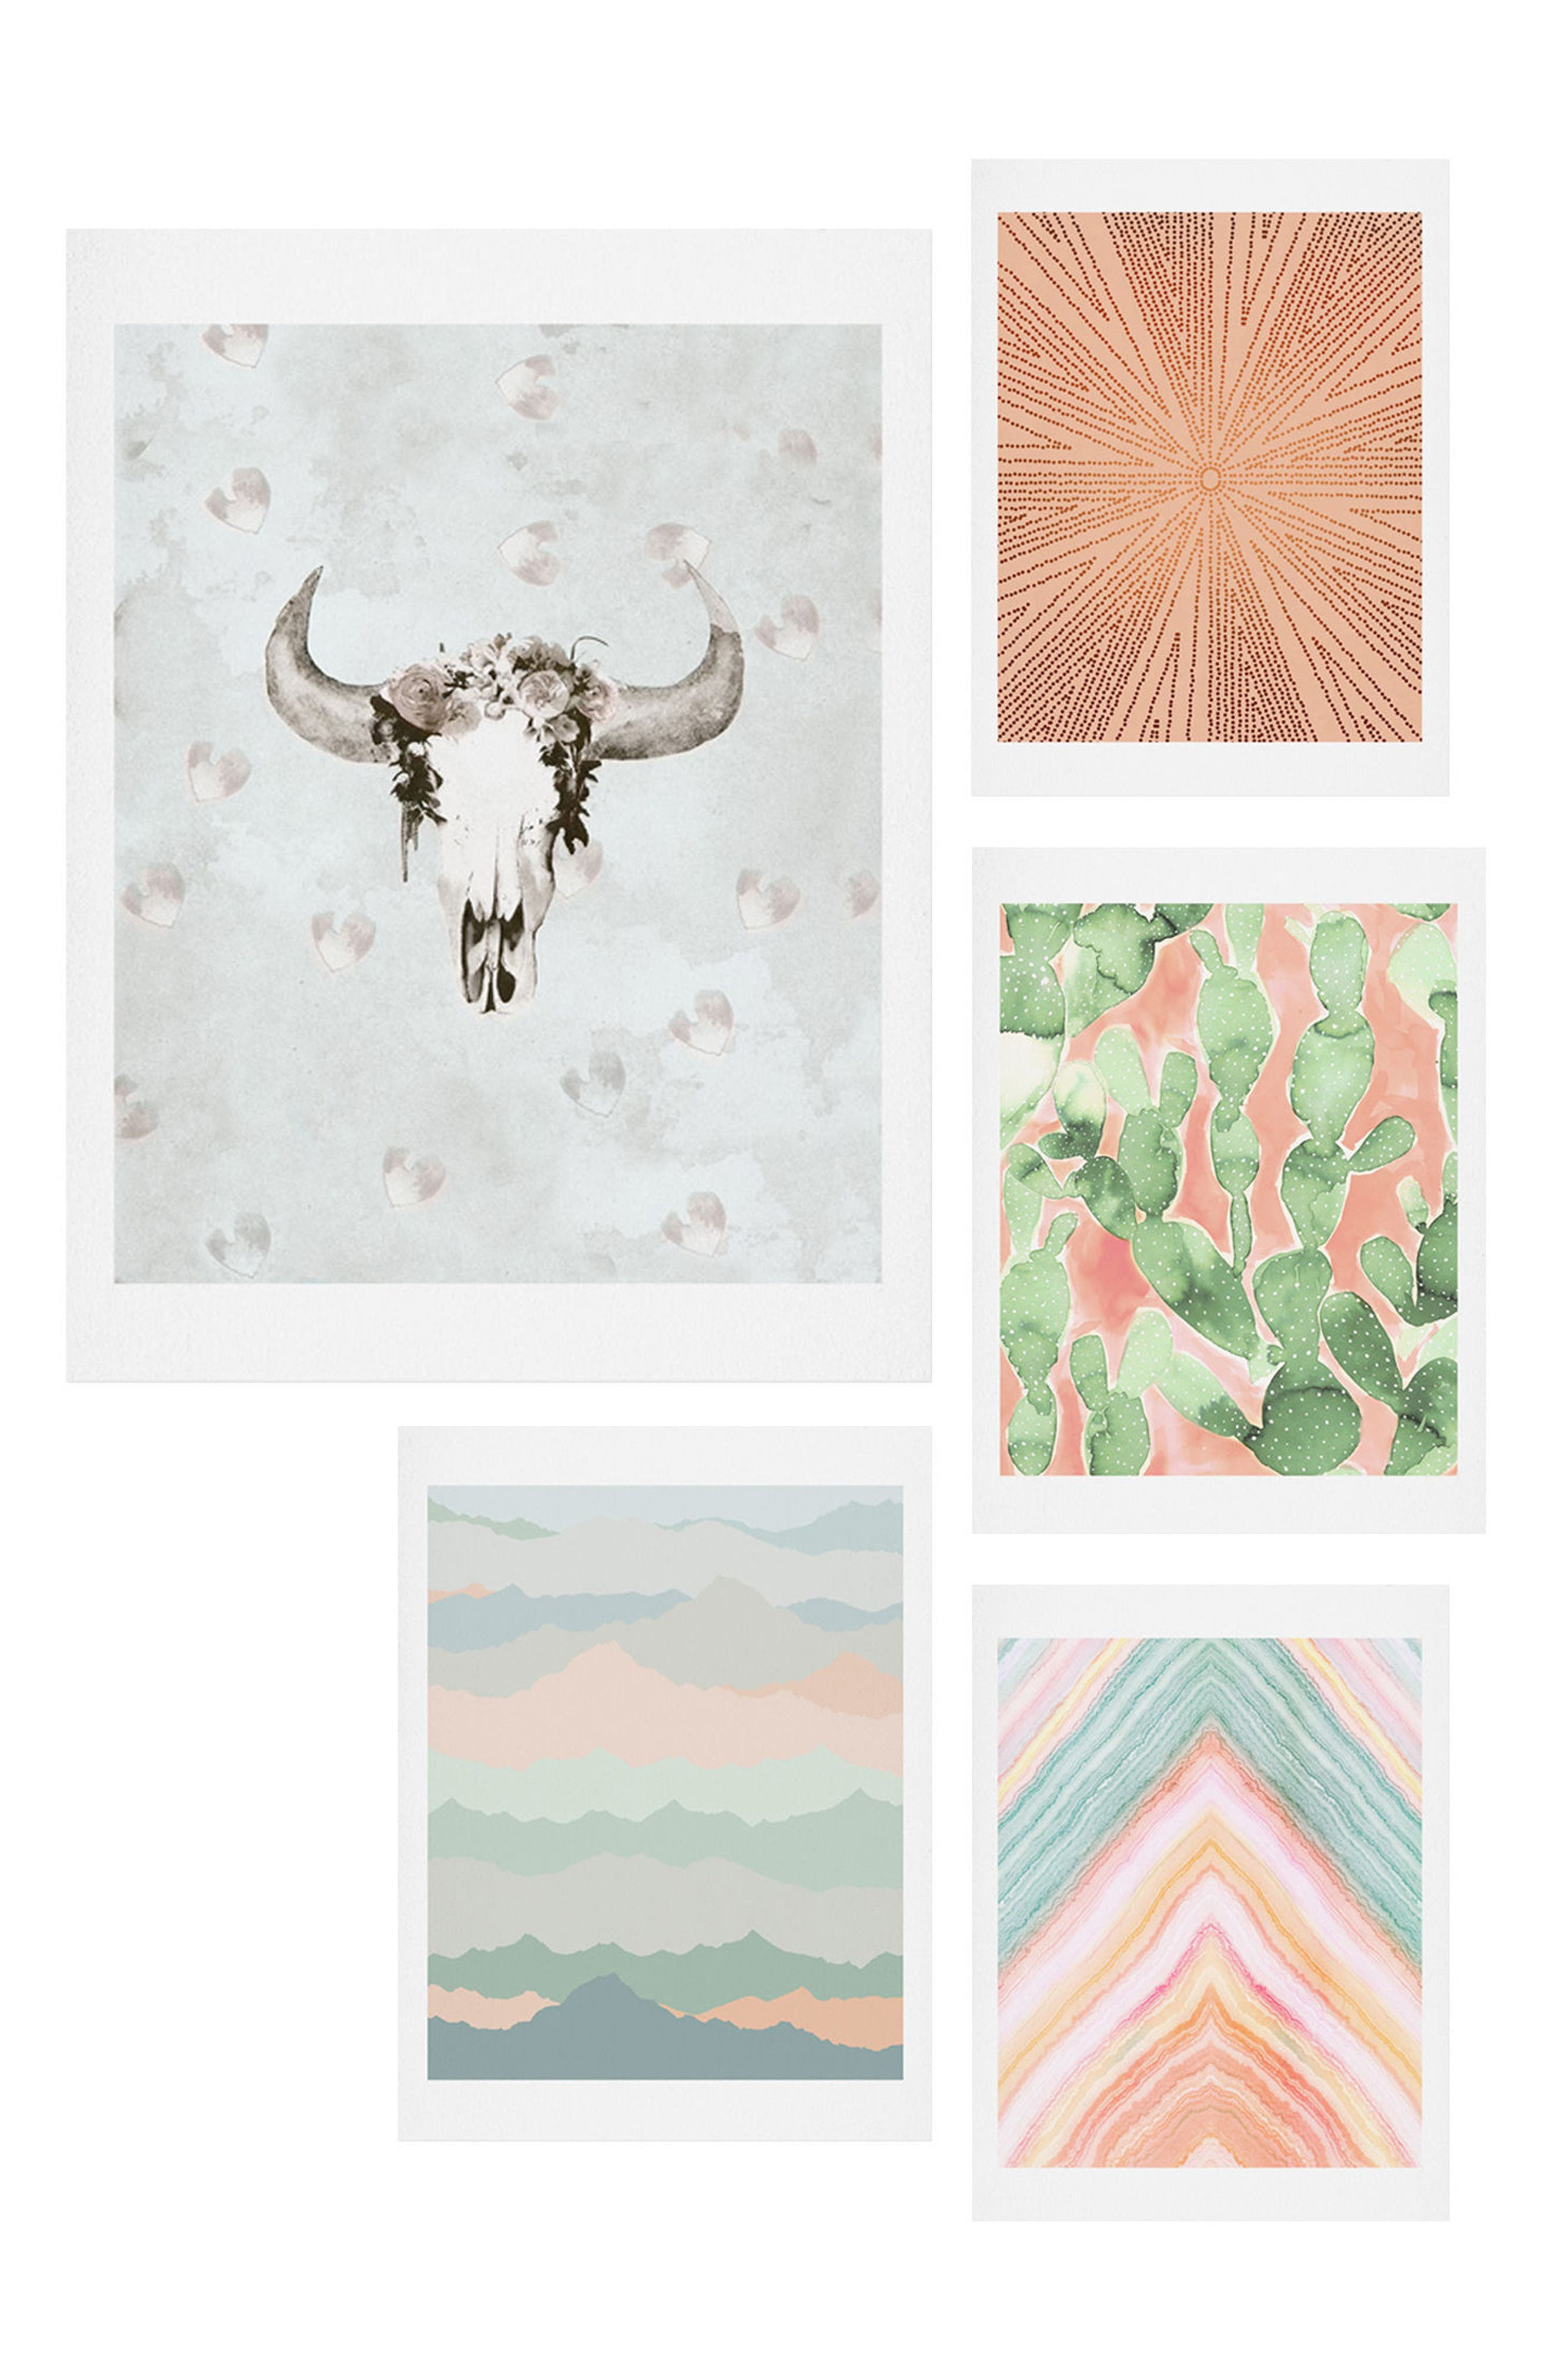 Main Image - Deny Designs Desert Matcha Five-Piece Gallery Wall Art Print Set